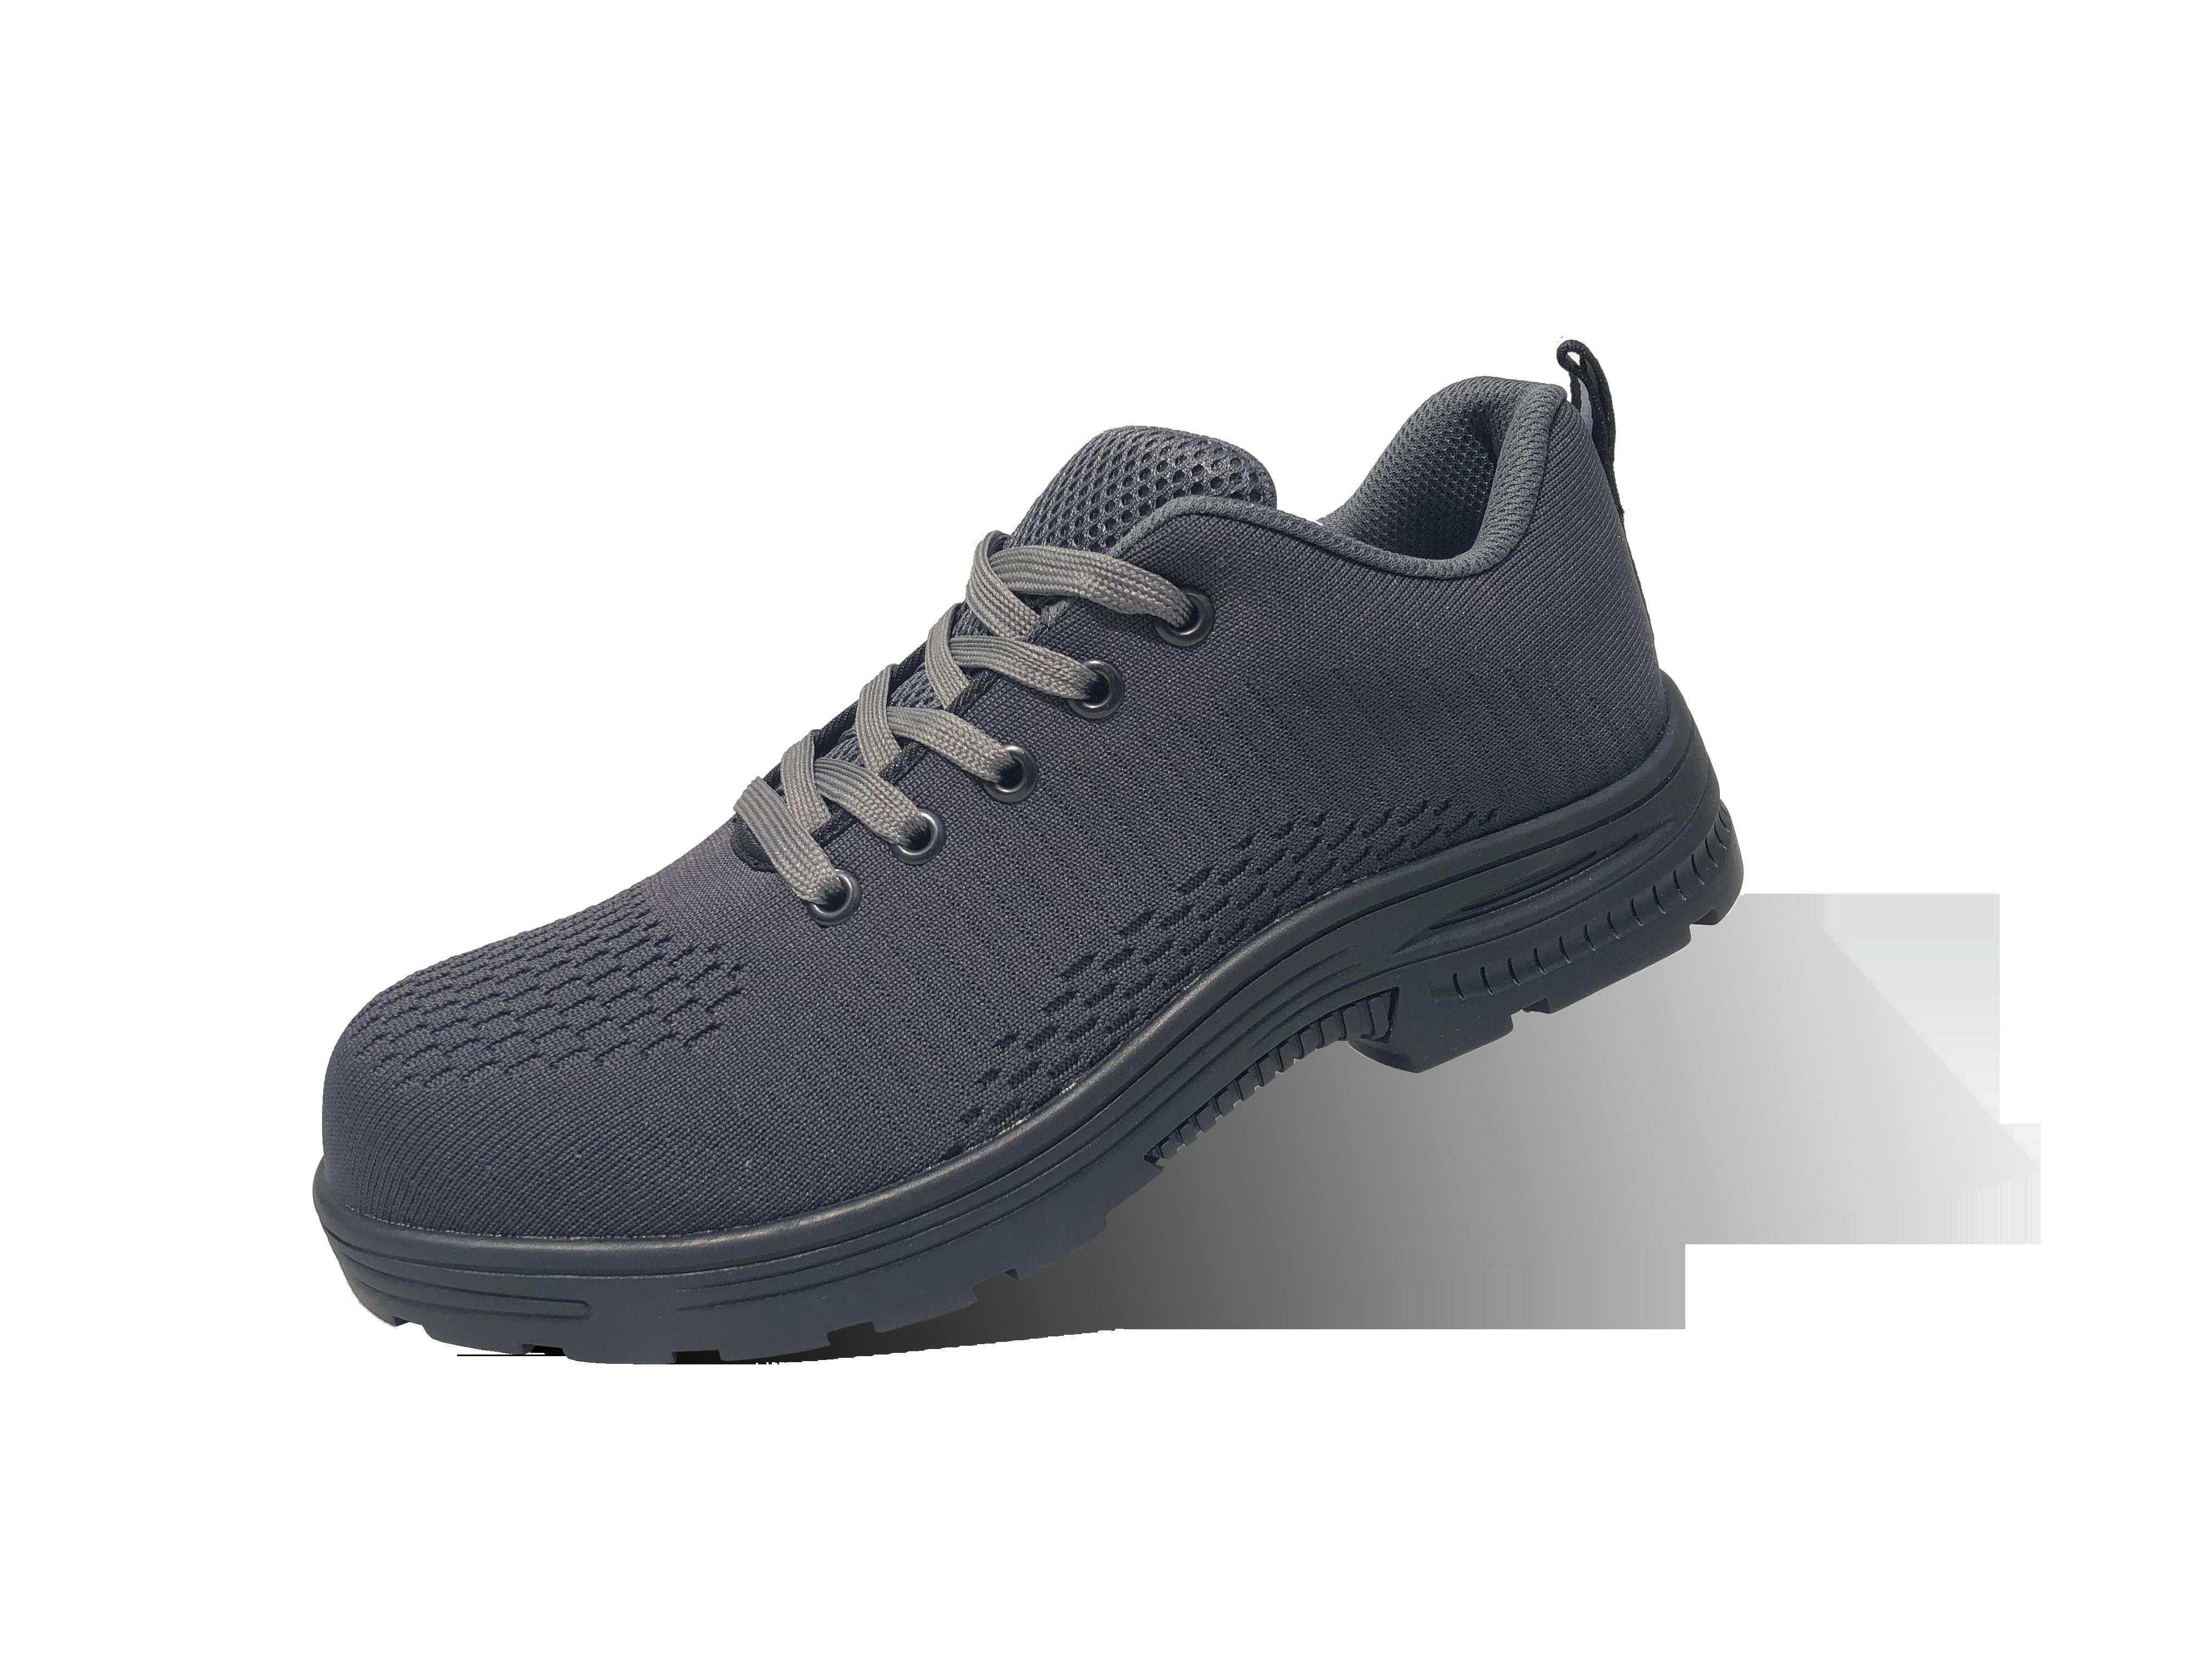 JC1721 Sport Safety Shoes